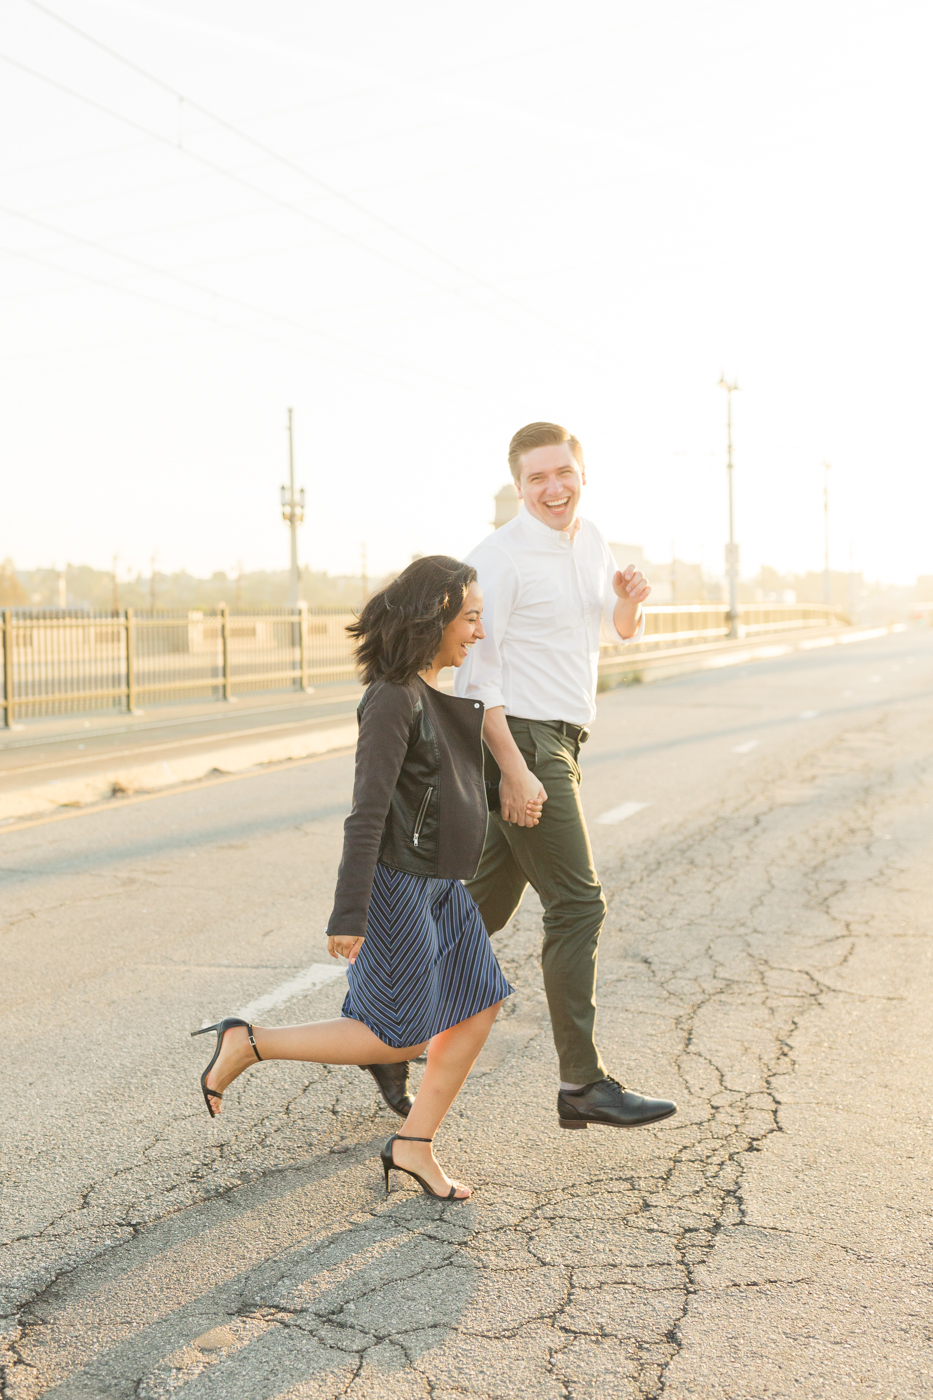 DTLA Engagement Session - Christa Norman Photography - Destination Wedding Photographer-1.jpg